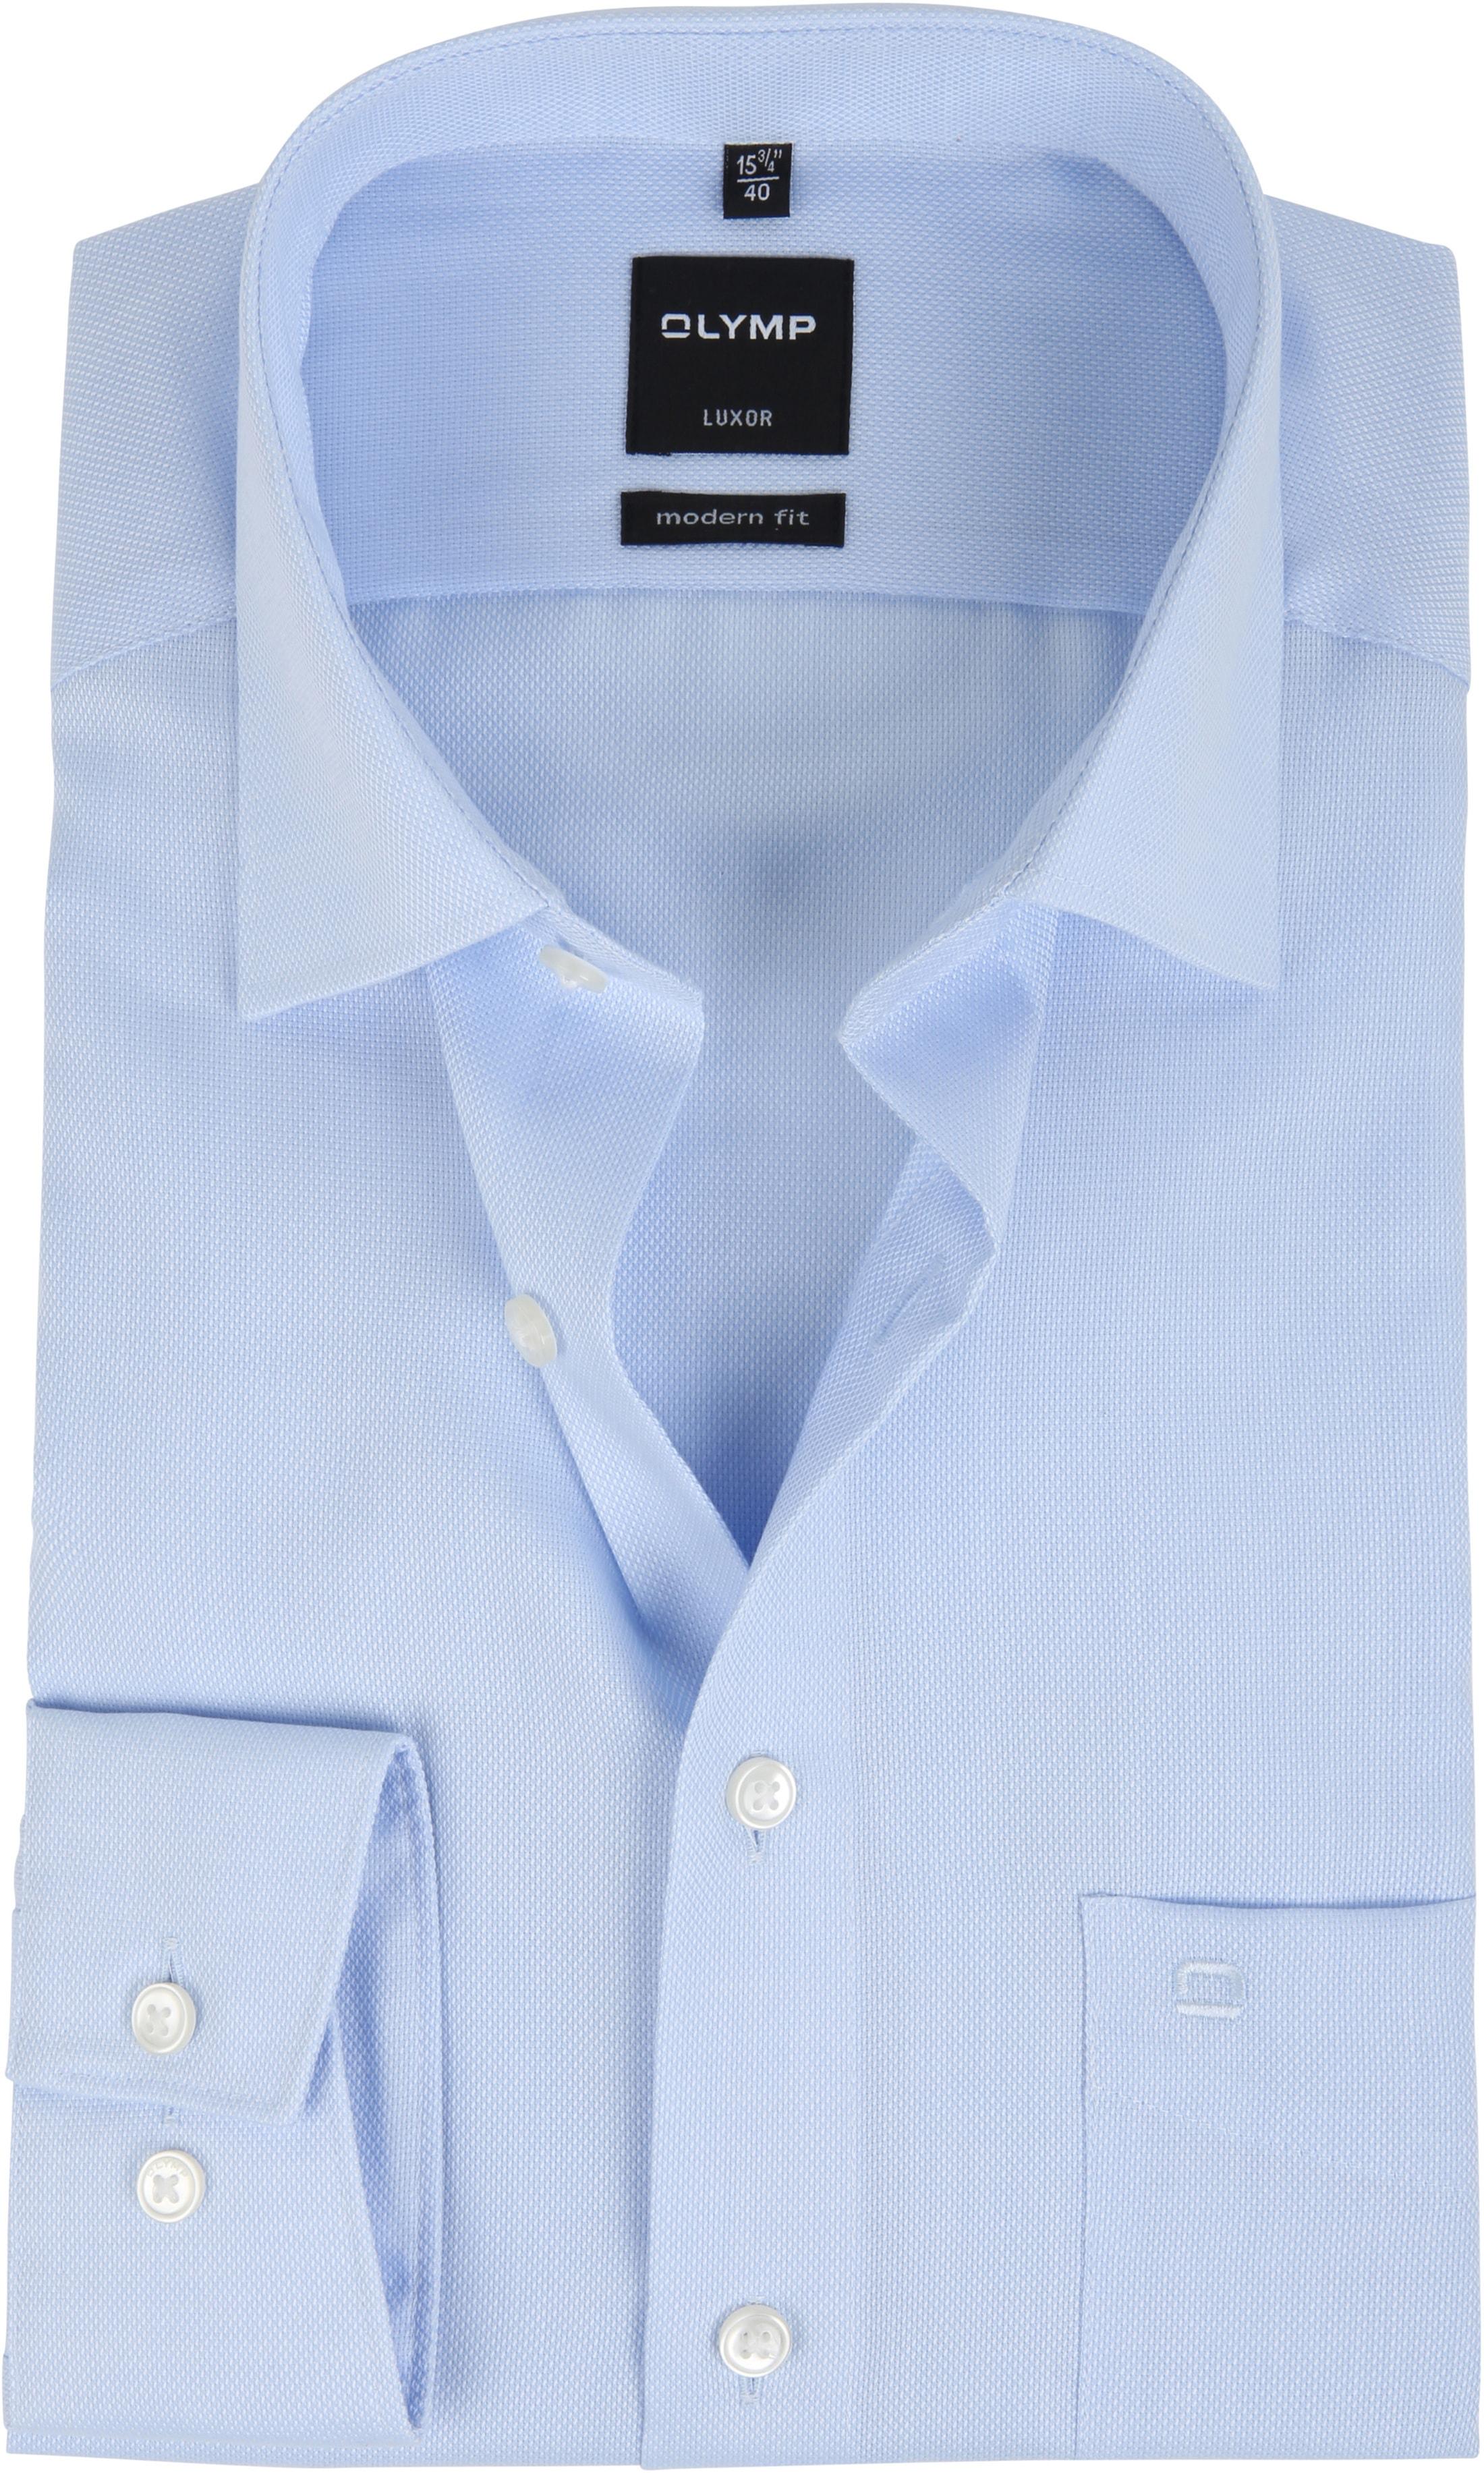 OLYMP Luxor Hemd Modern Fit Blue Derby